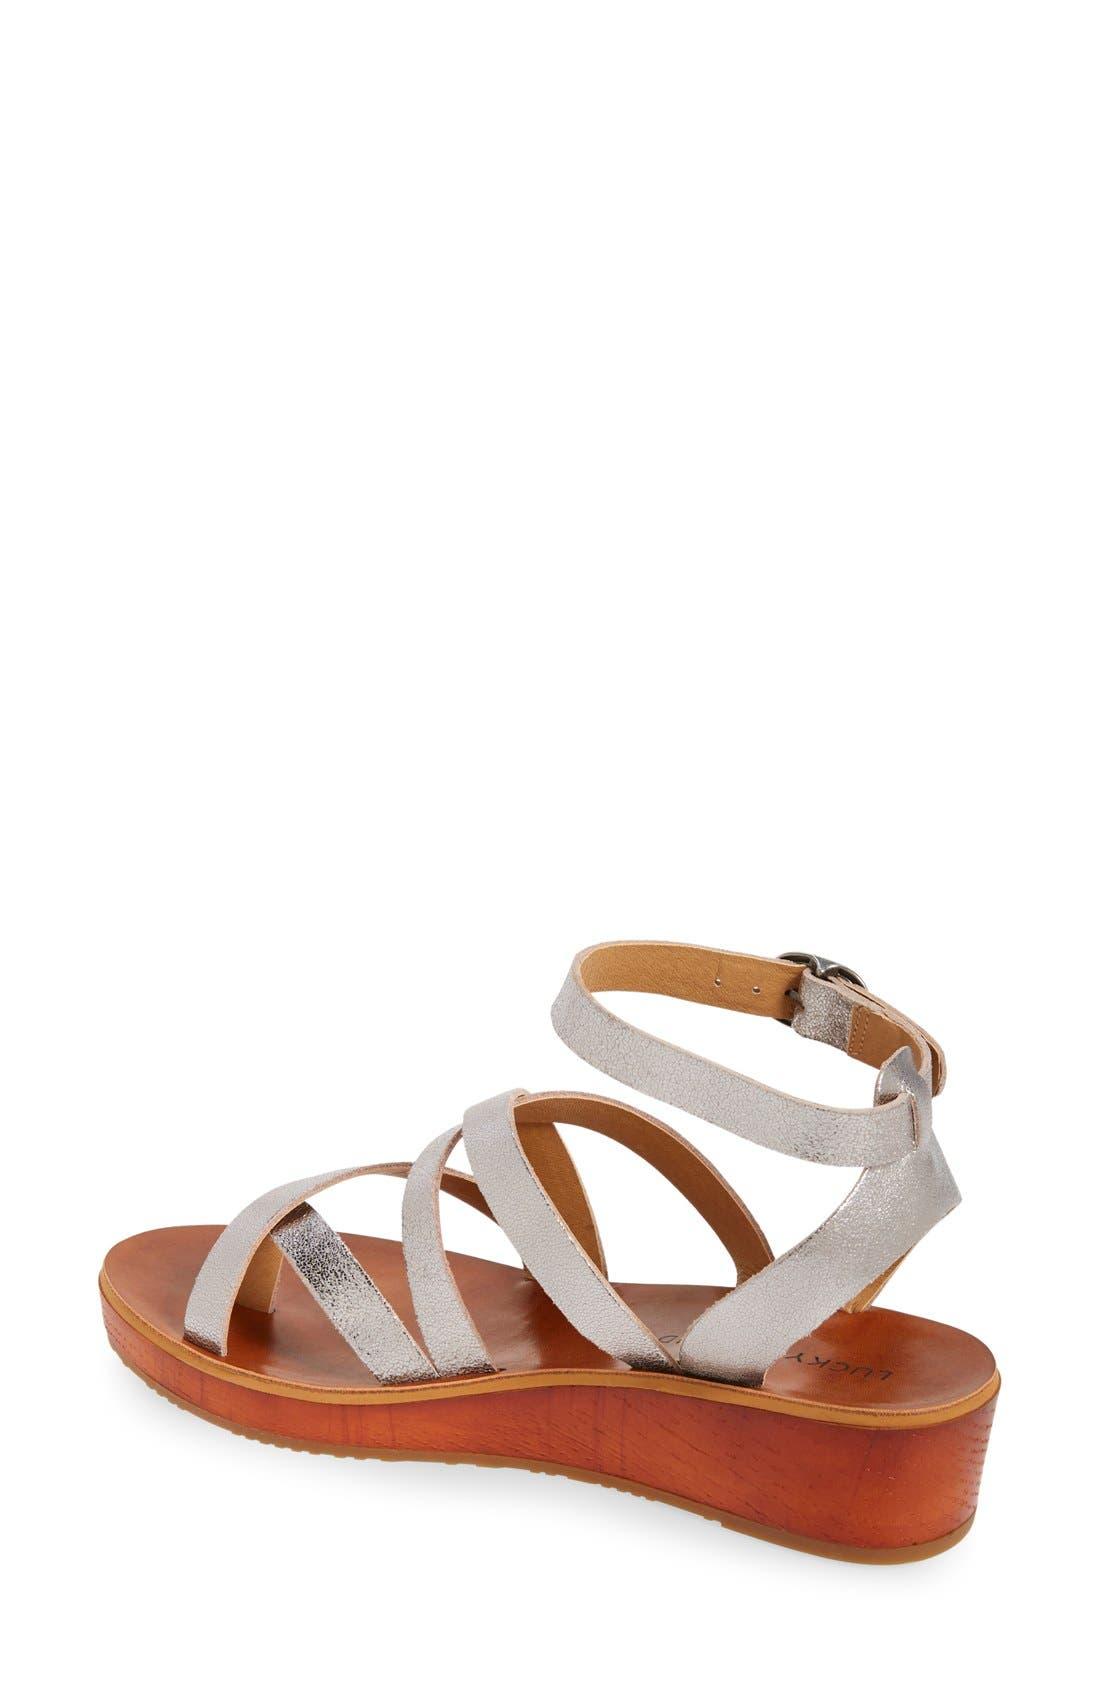 'Honeyy' Platform Sandal,                             Alternate thumbnail 7, color,